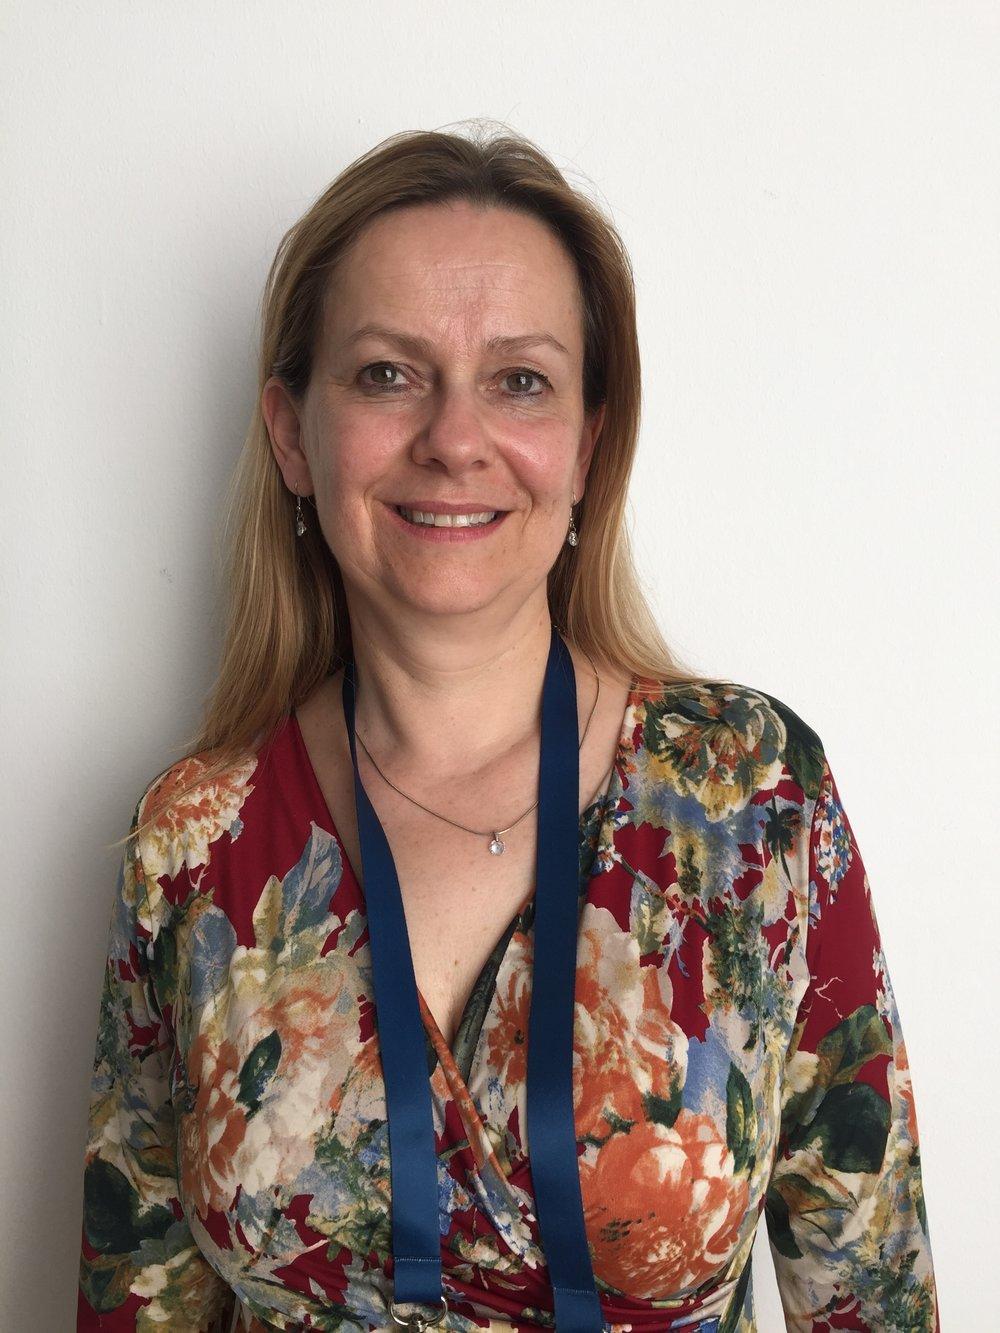 Czech Republic Dr. Marketa Gerlichova